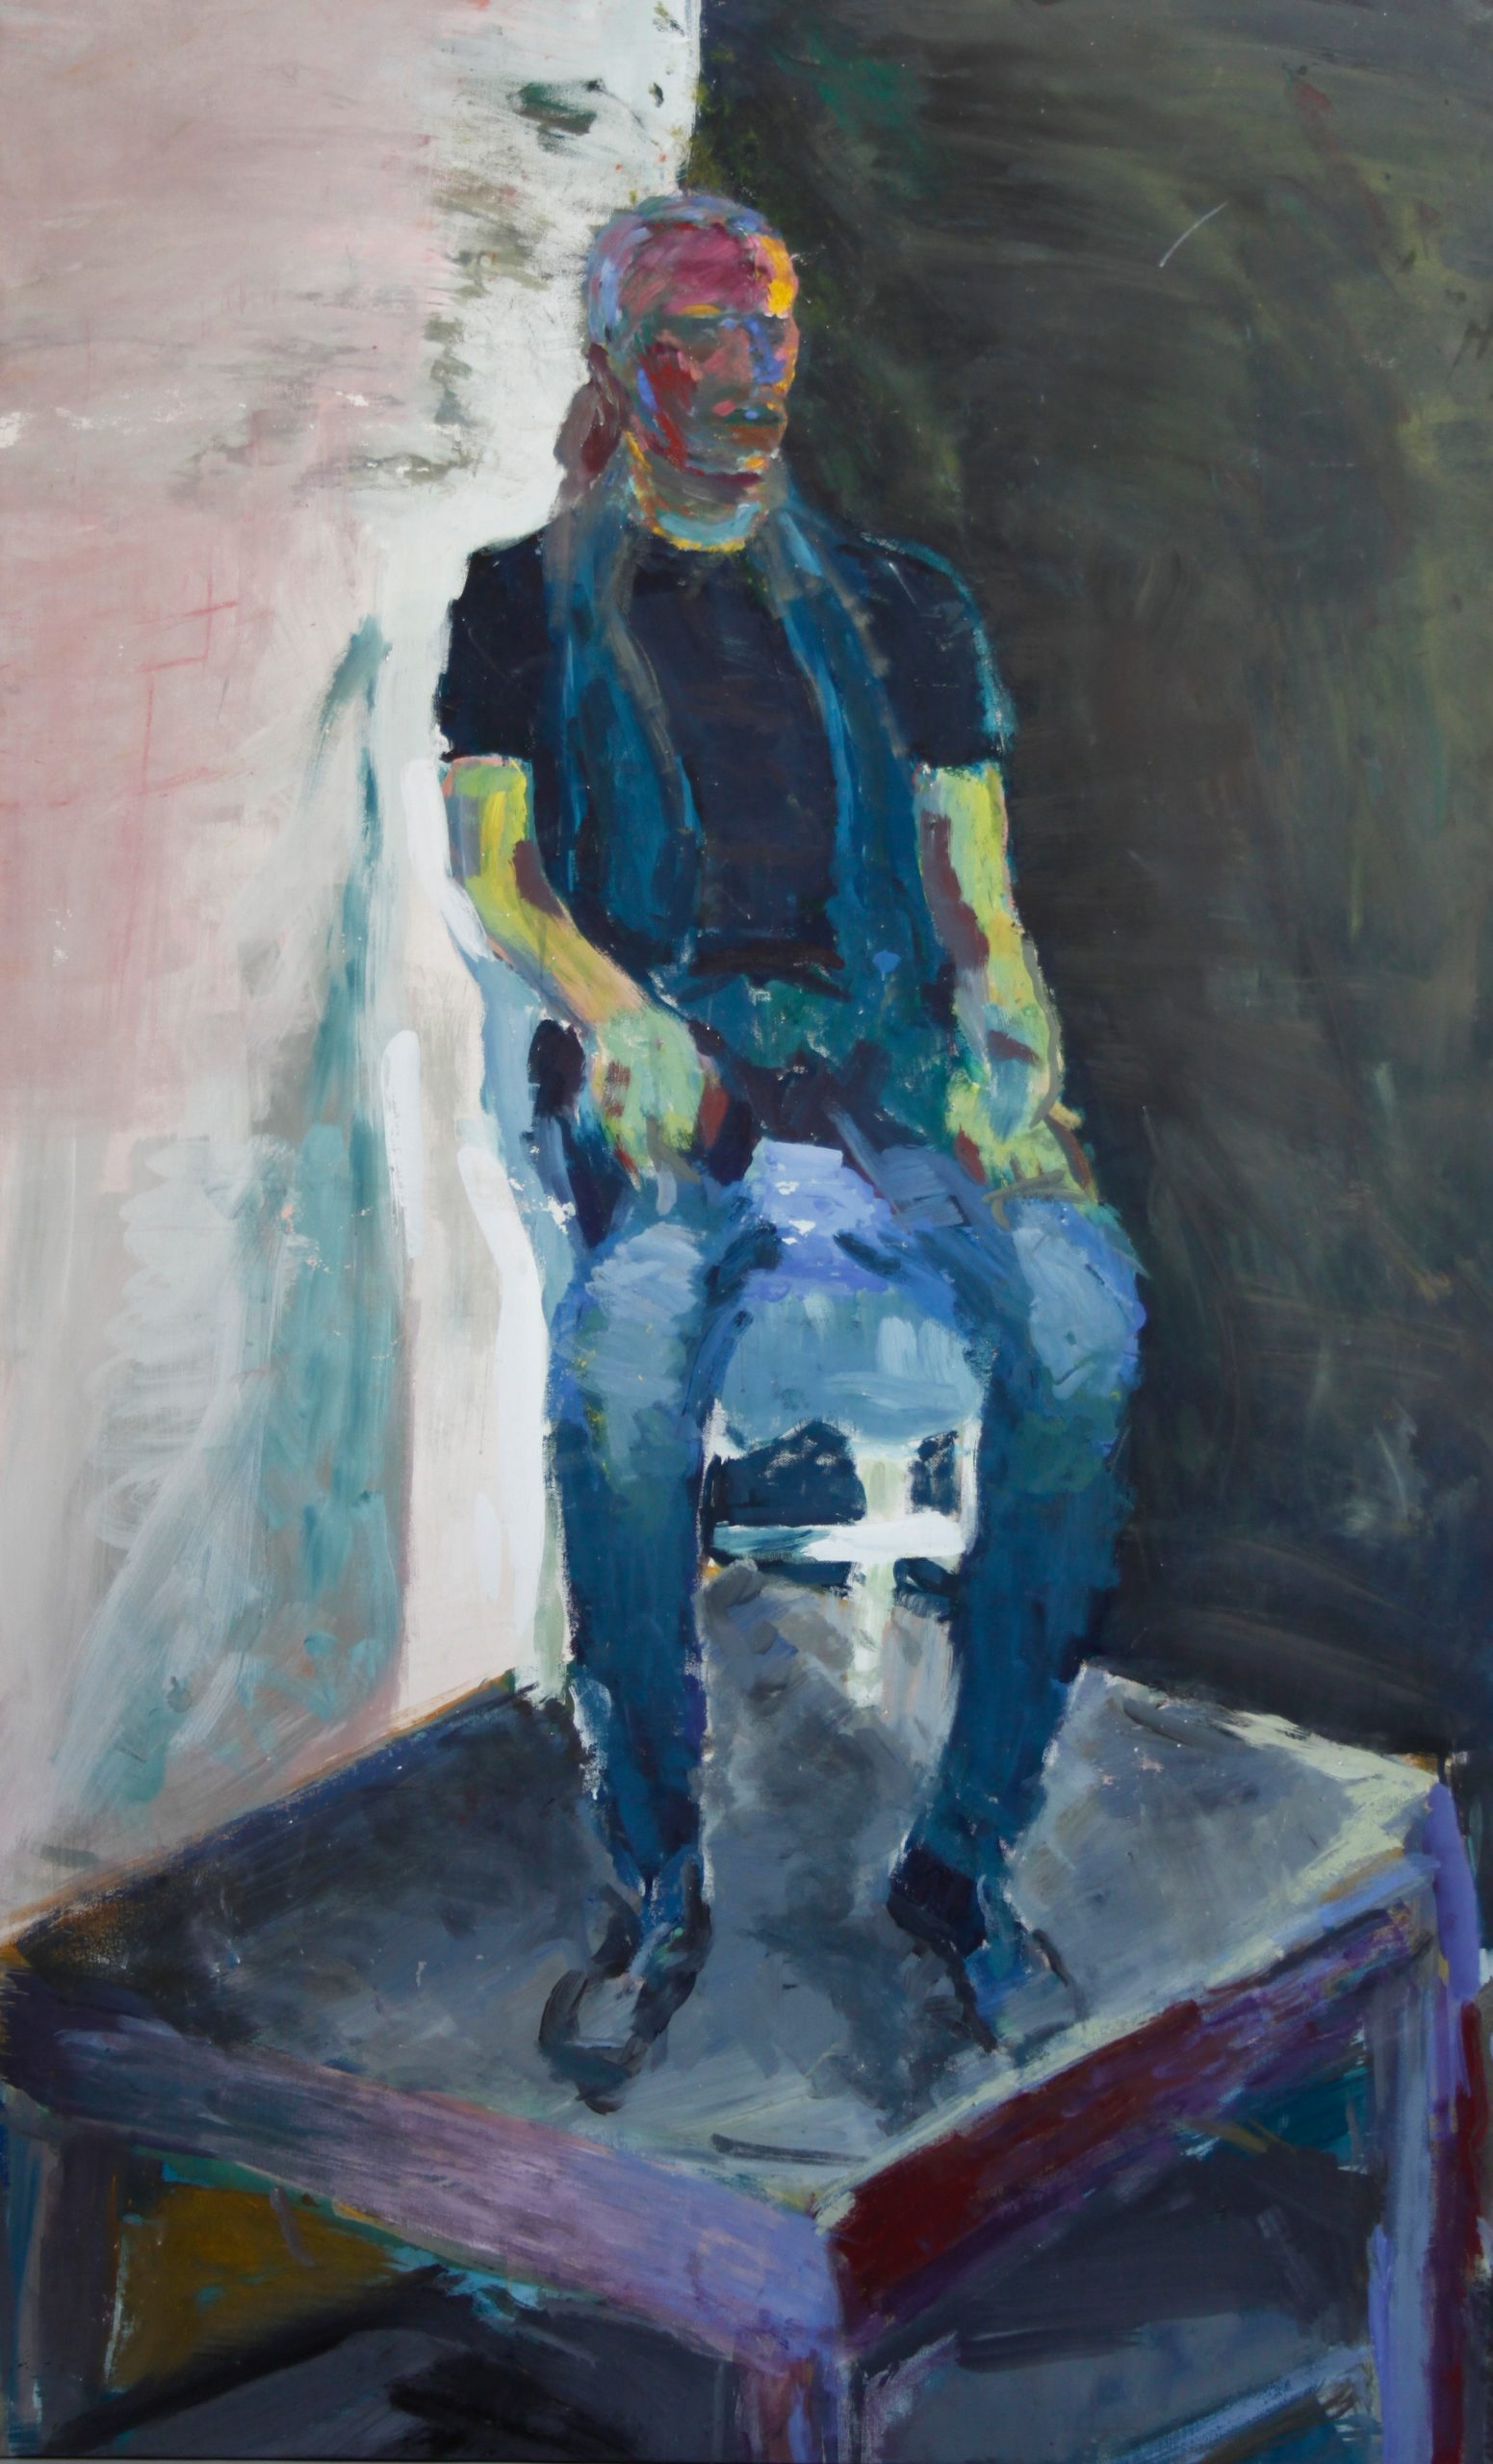 6Acrylic.Sitting.87x183cm